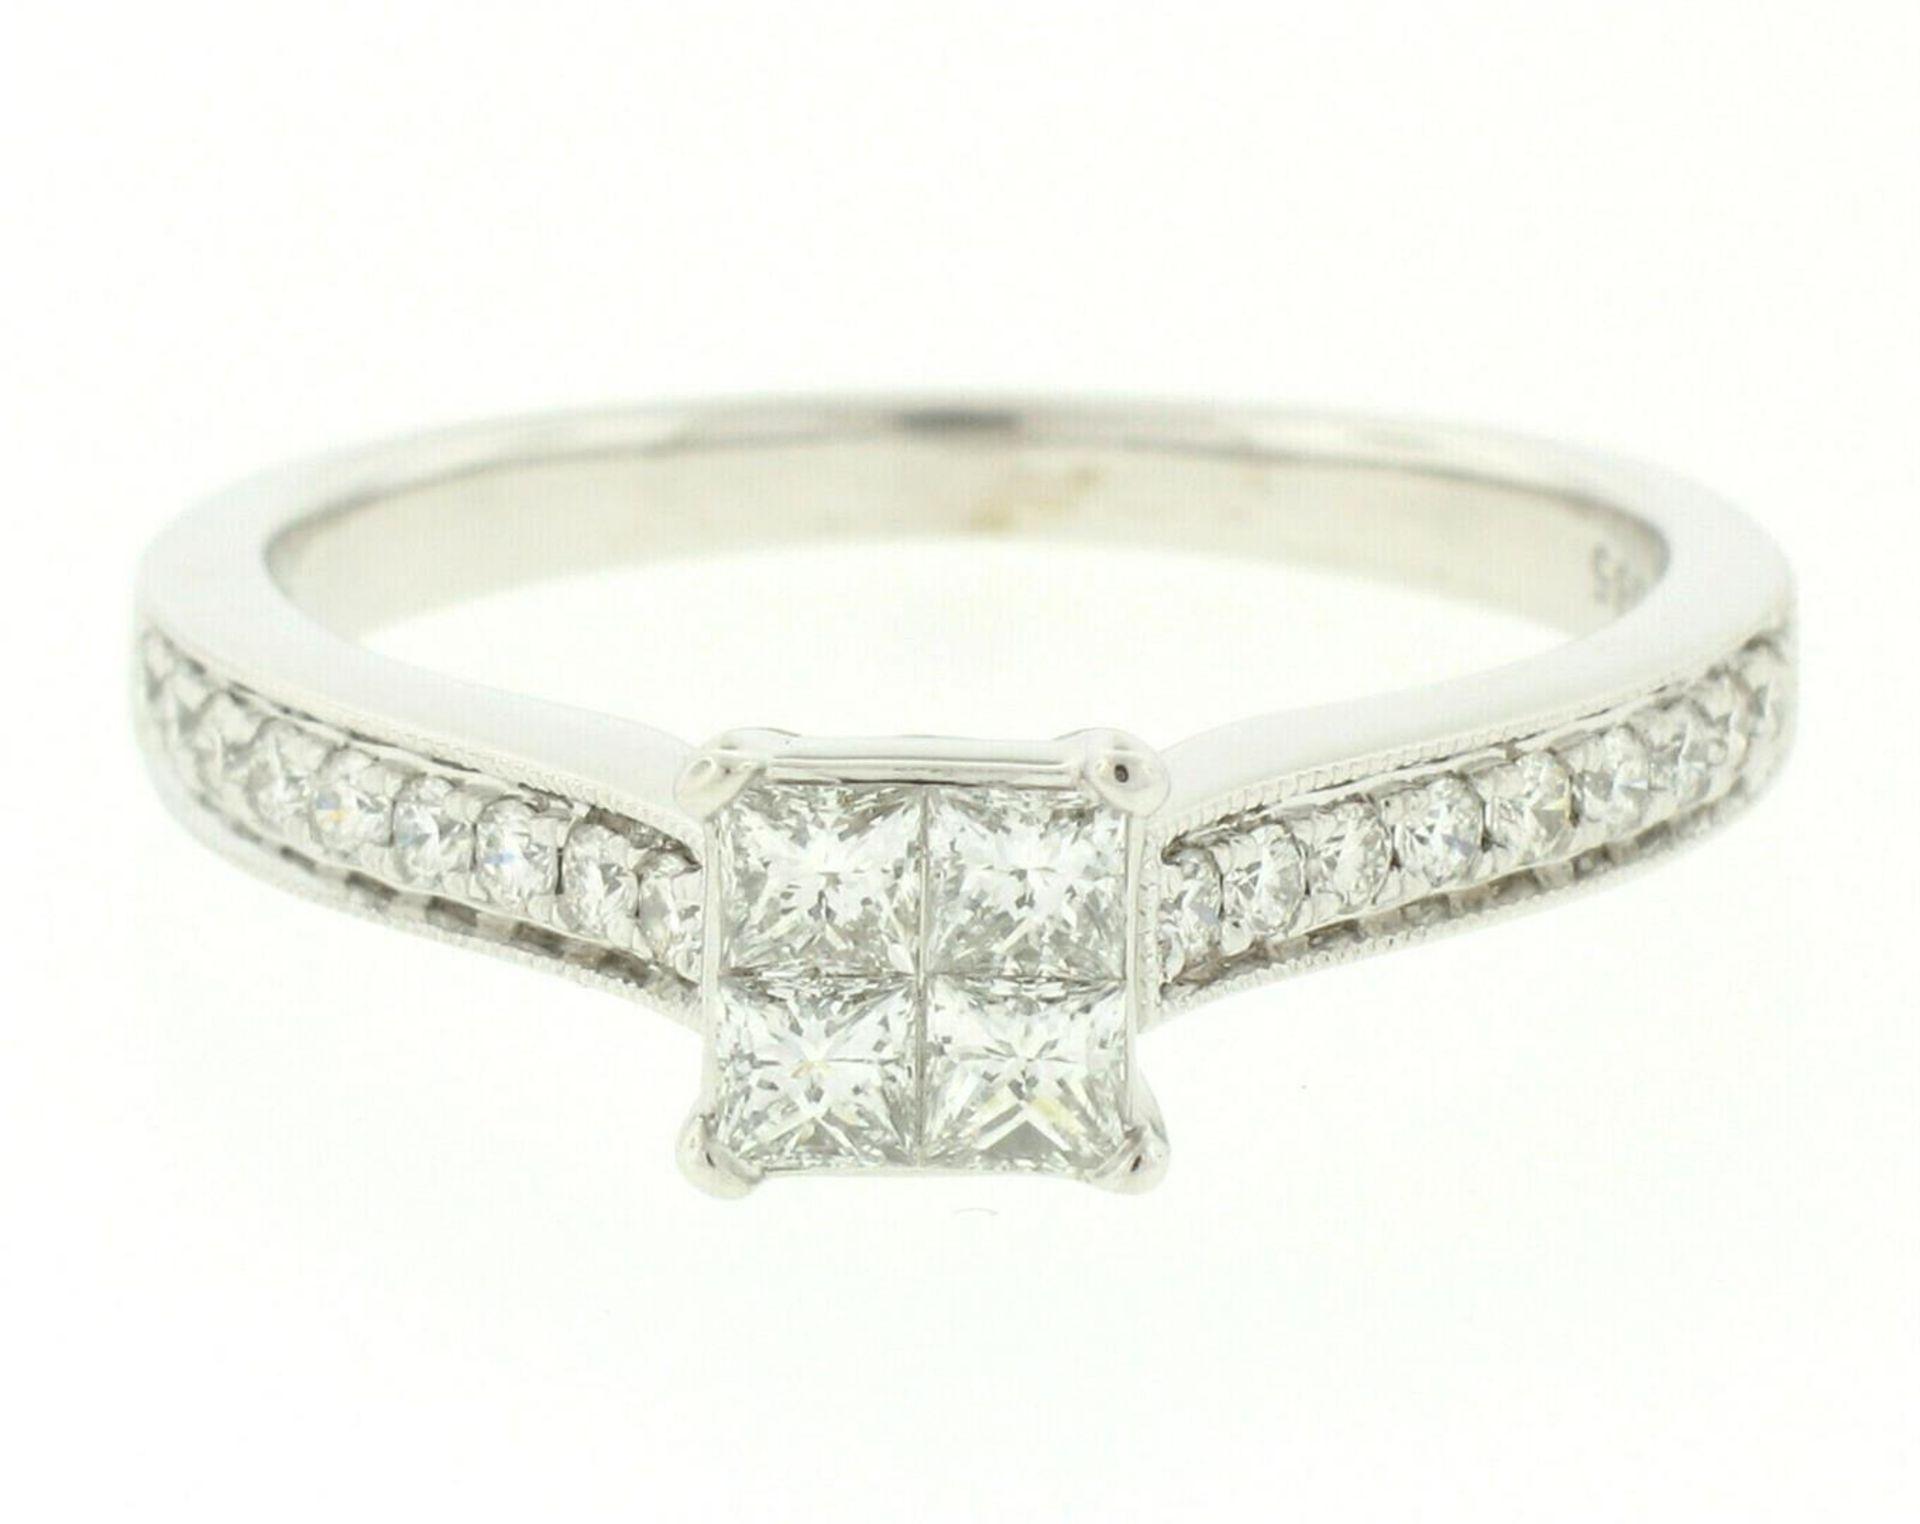 14k White Gold 0.79ctw Illusion Solitaire Princess Cut Diamond Engagement Ring